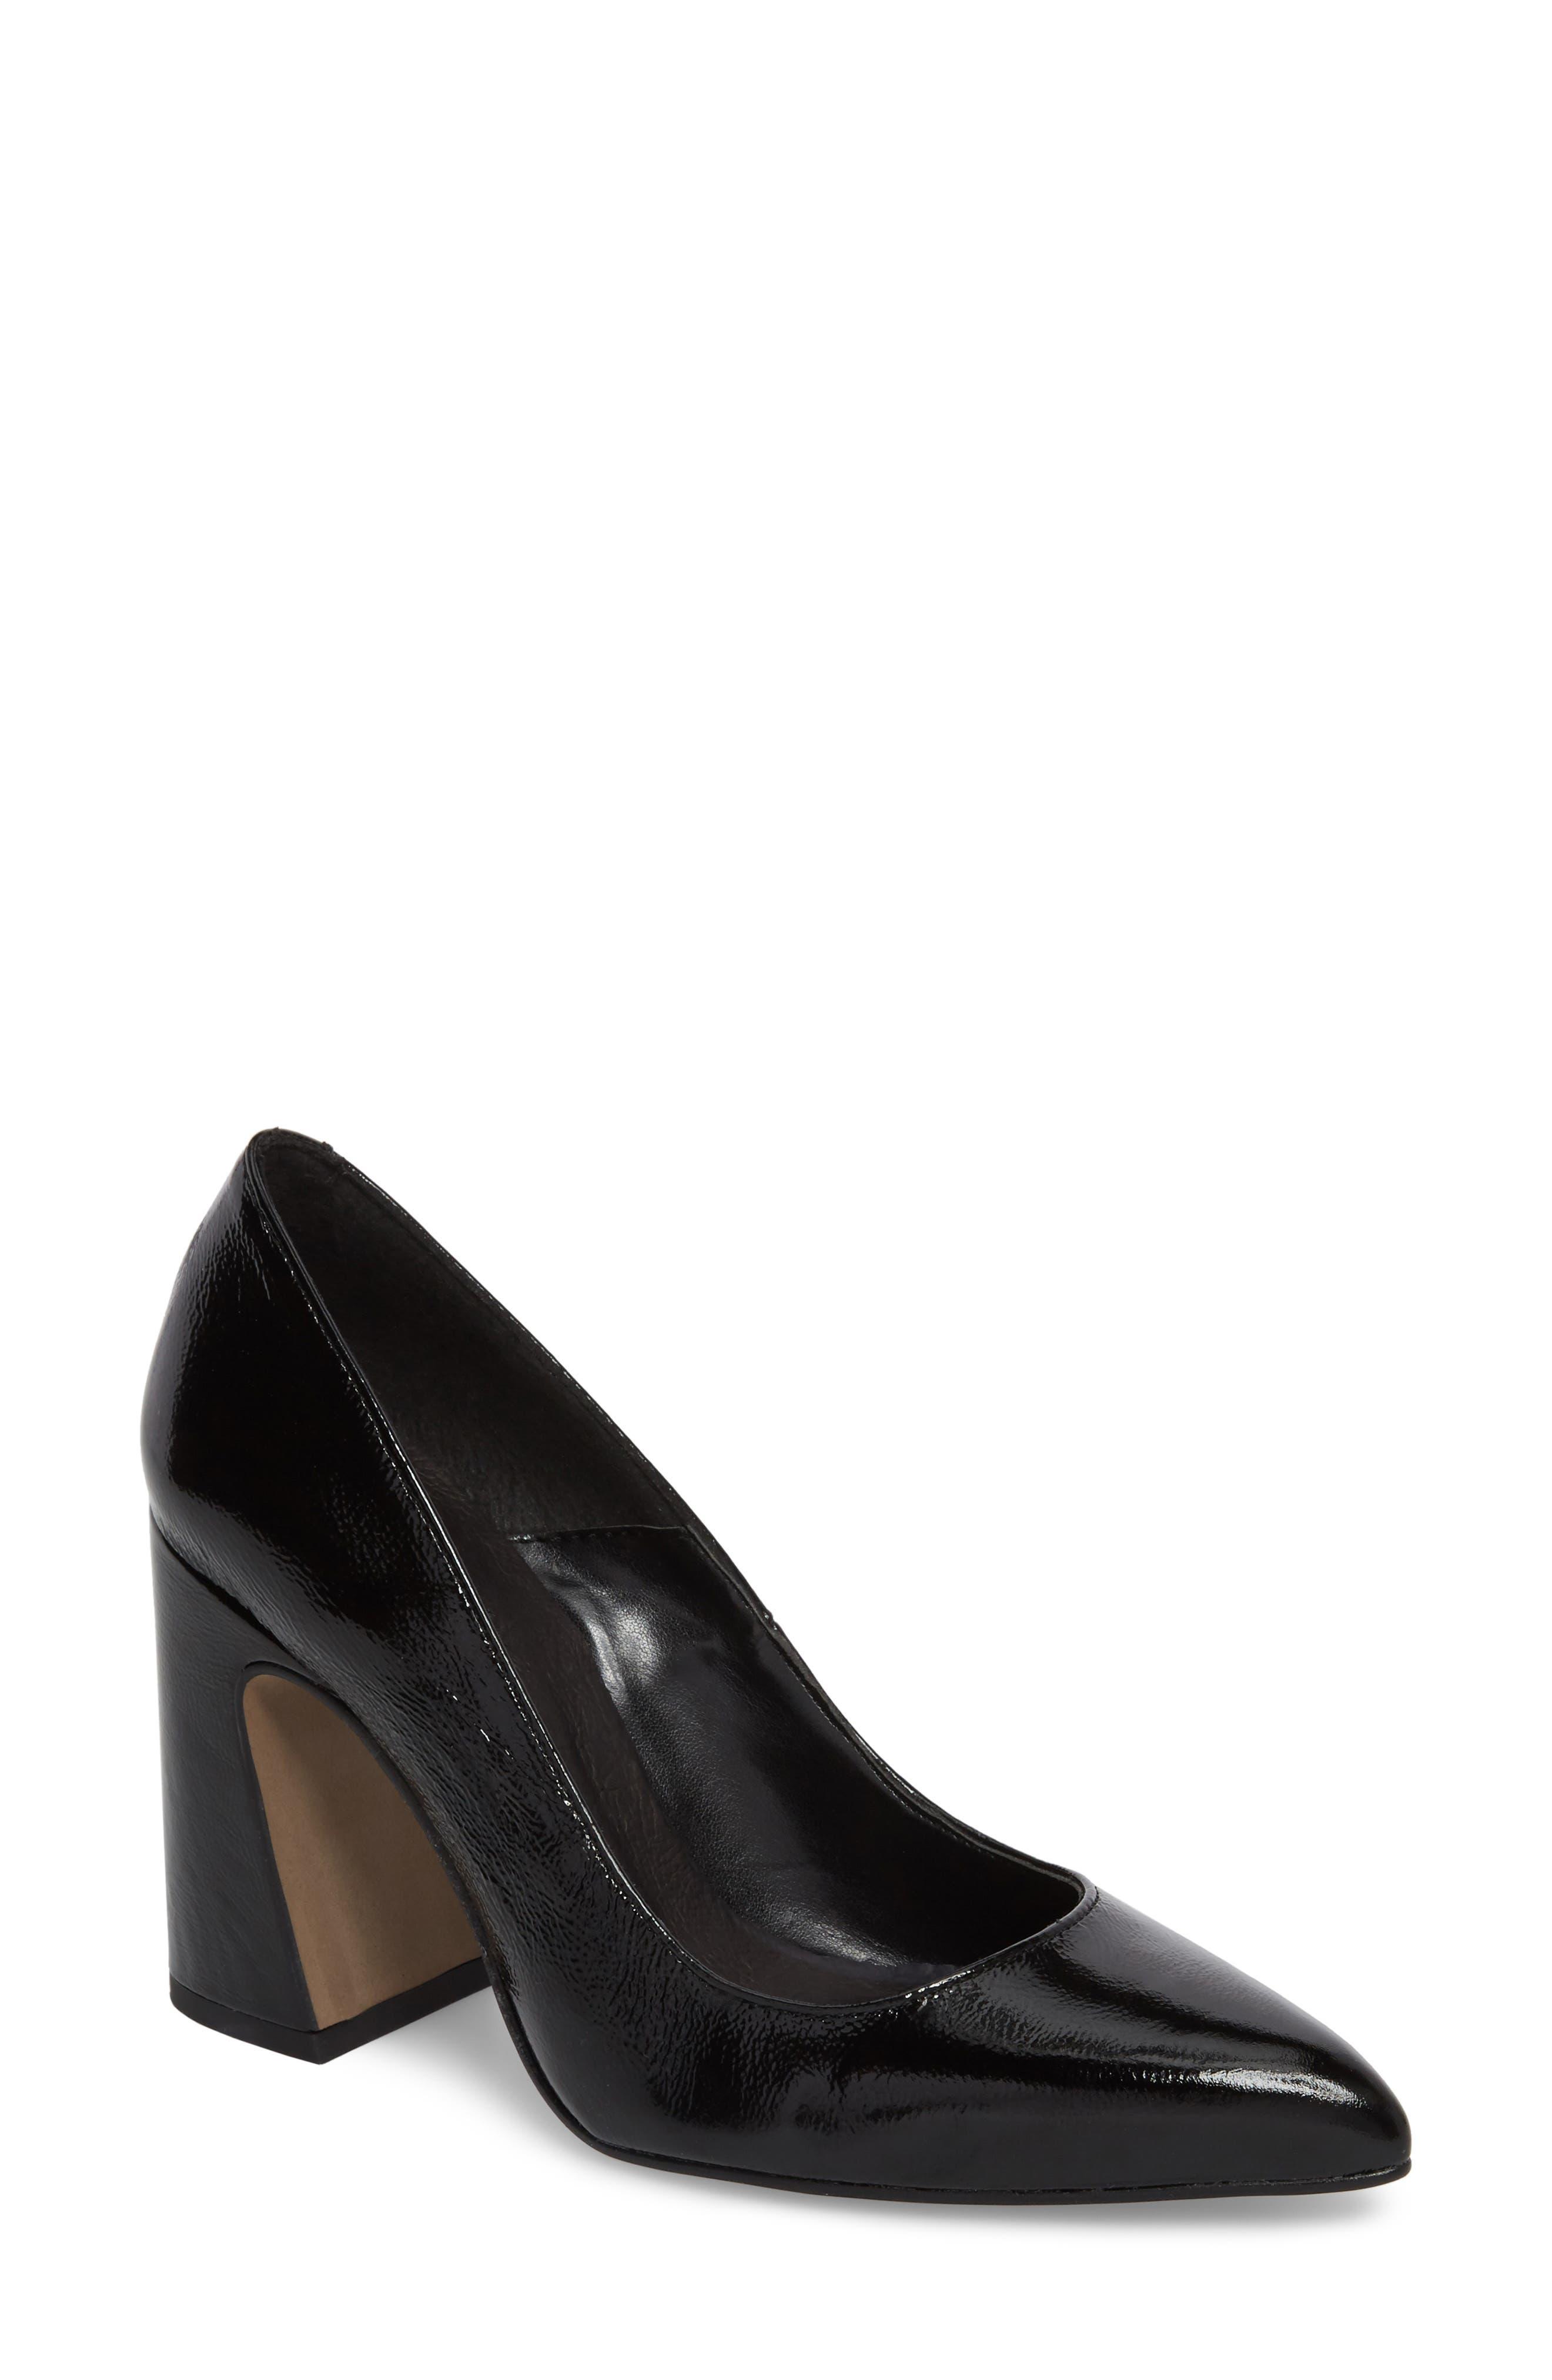 0851cddefb Women's Topshop Shoes   Nordstrom